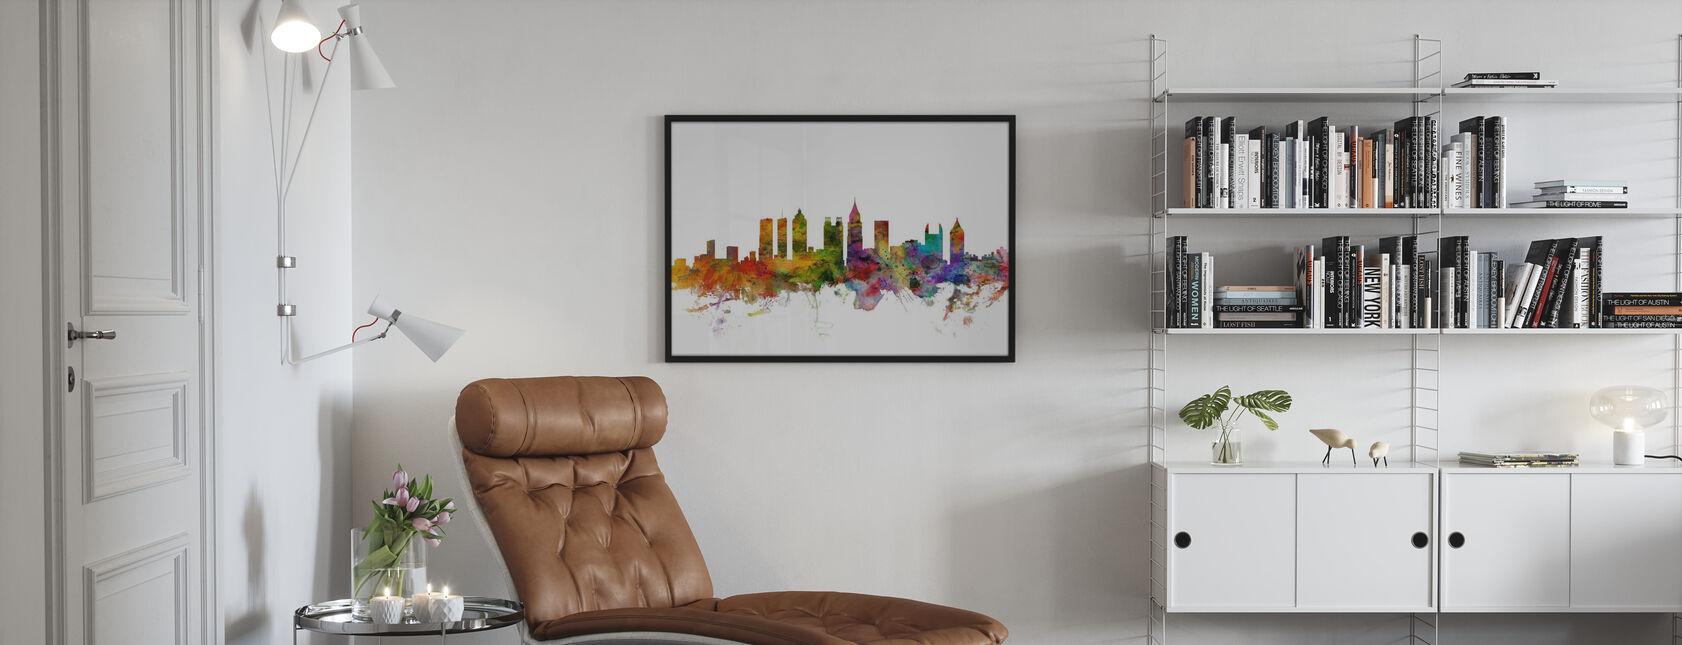 Atlanta Georgia Skyline - Framed print - Living Room